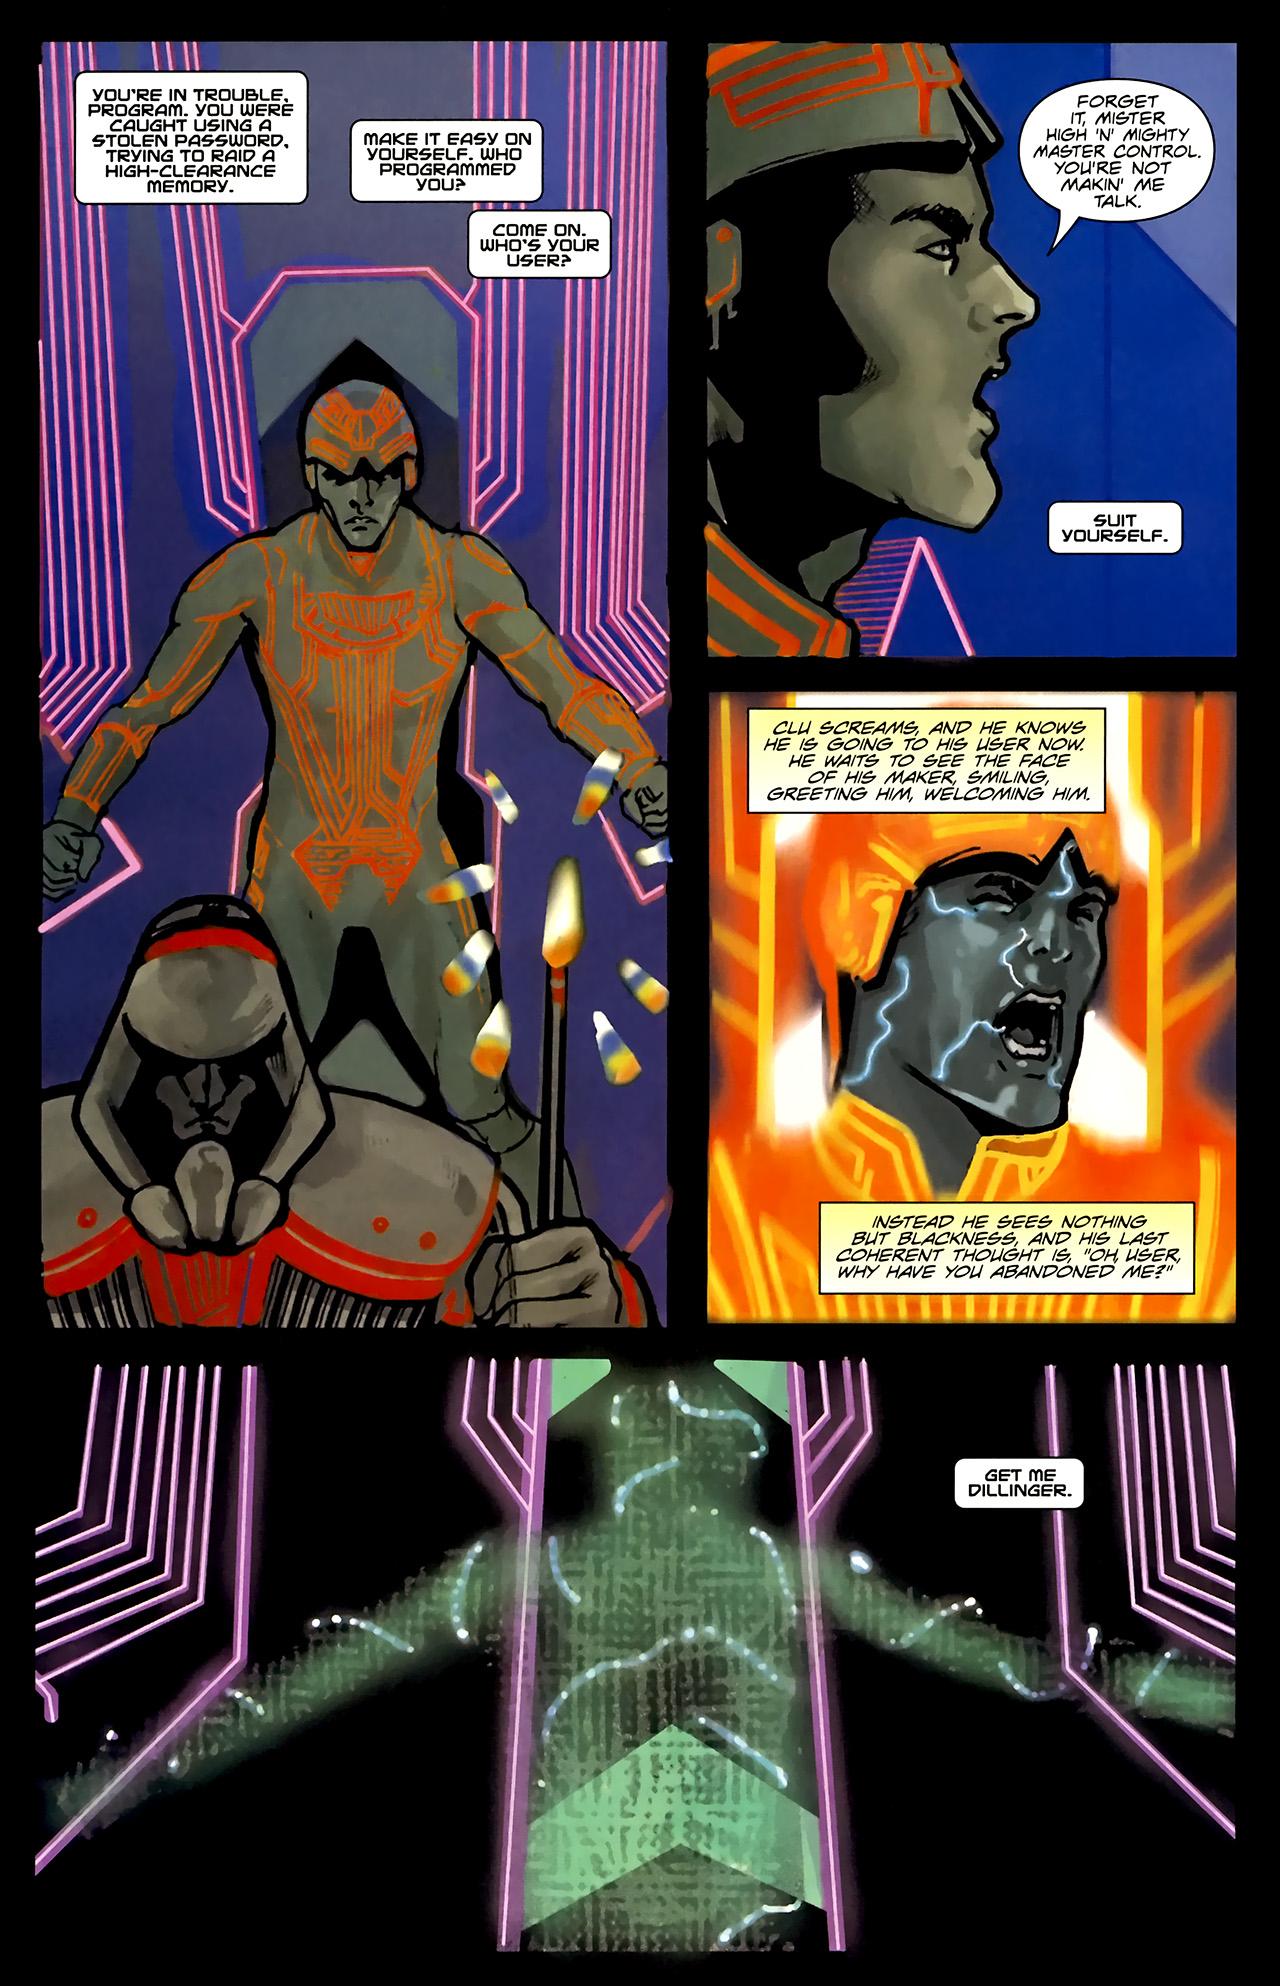 Read online TRON: Original Movie Adaptation comic -  Issue #1 - 14